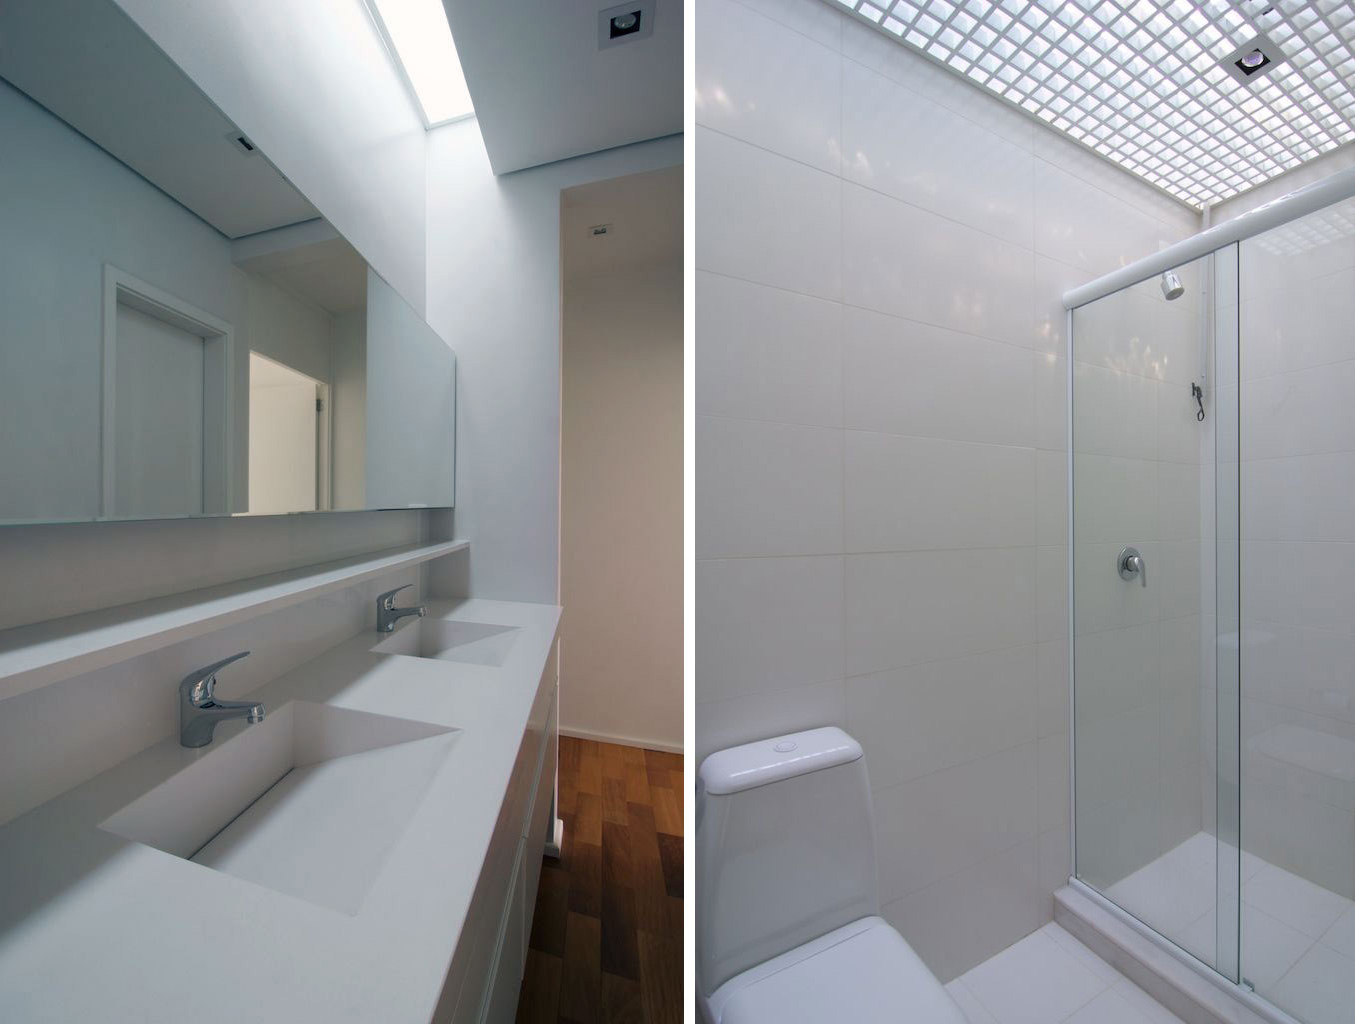 Bathroom, Modern Bungalow in Bento Gonçalves, Brazil